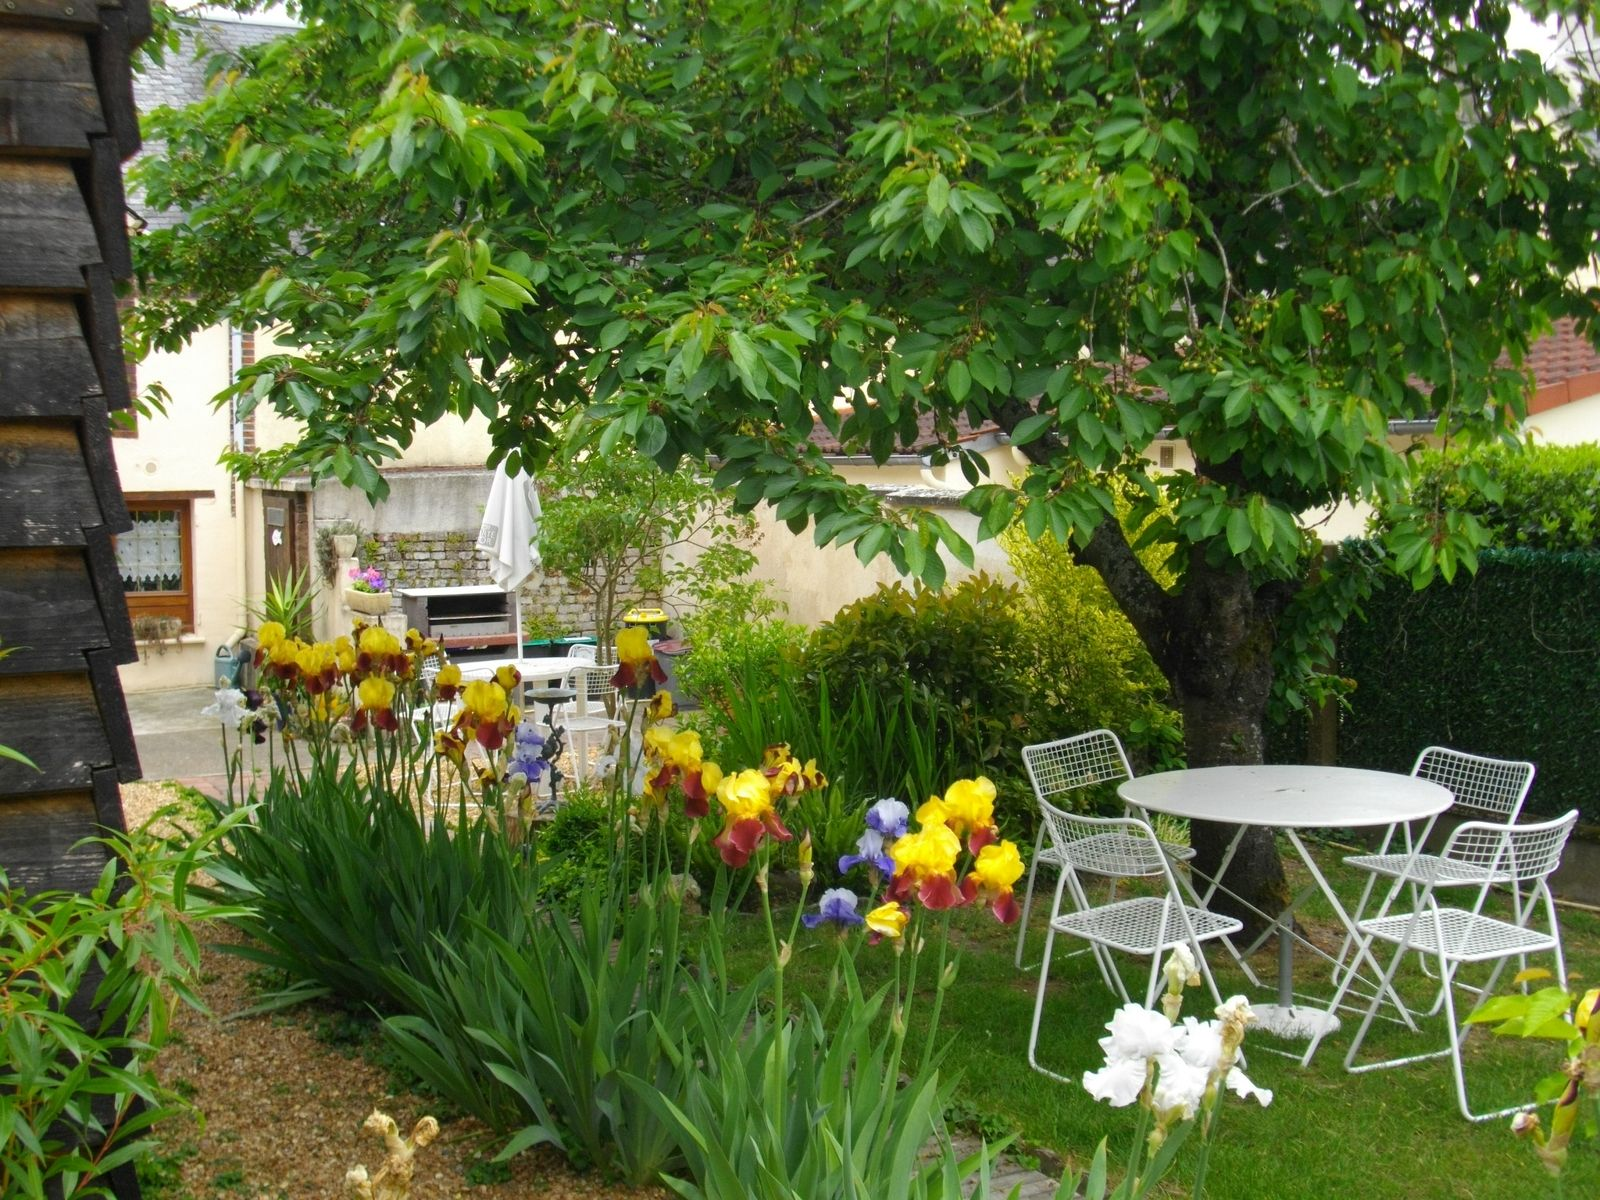 Jardin fleuri avec terrasse, barbecue et local pêche